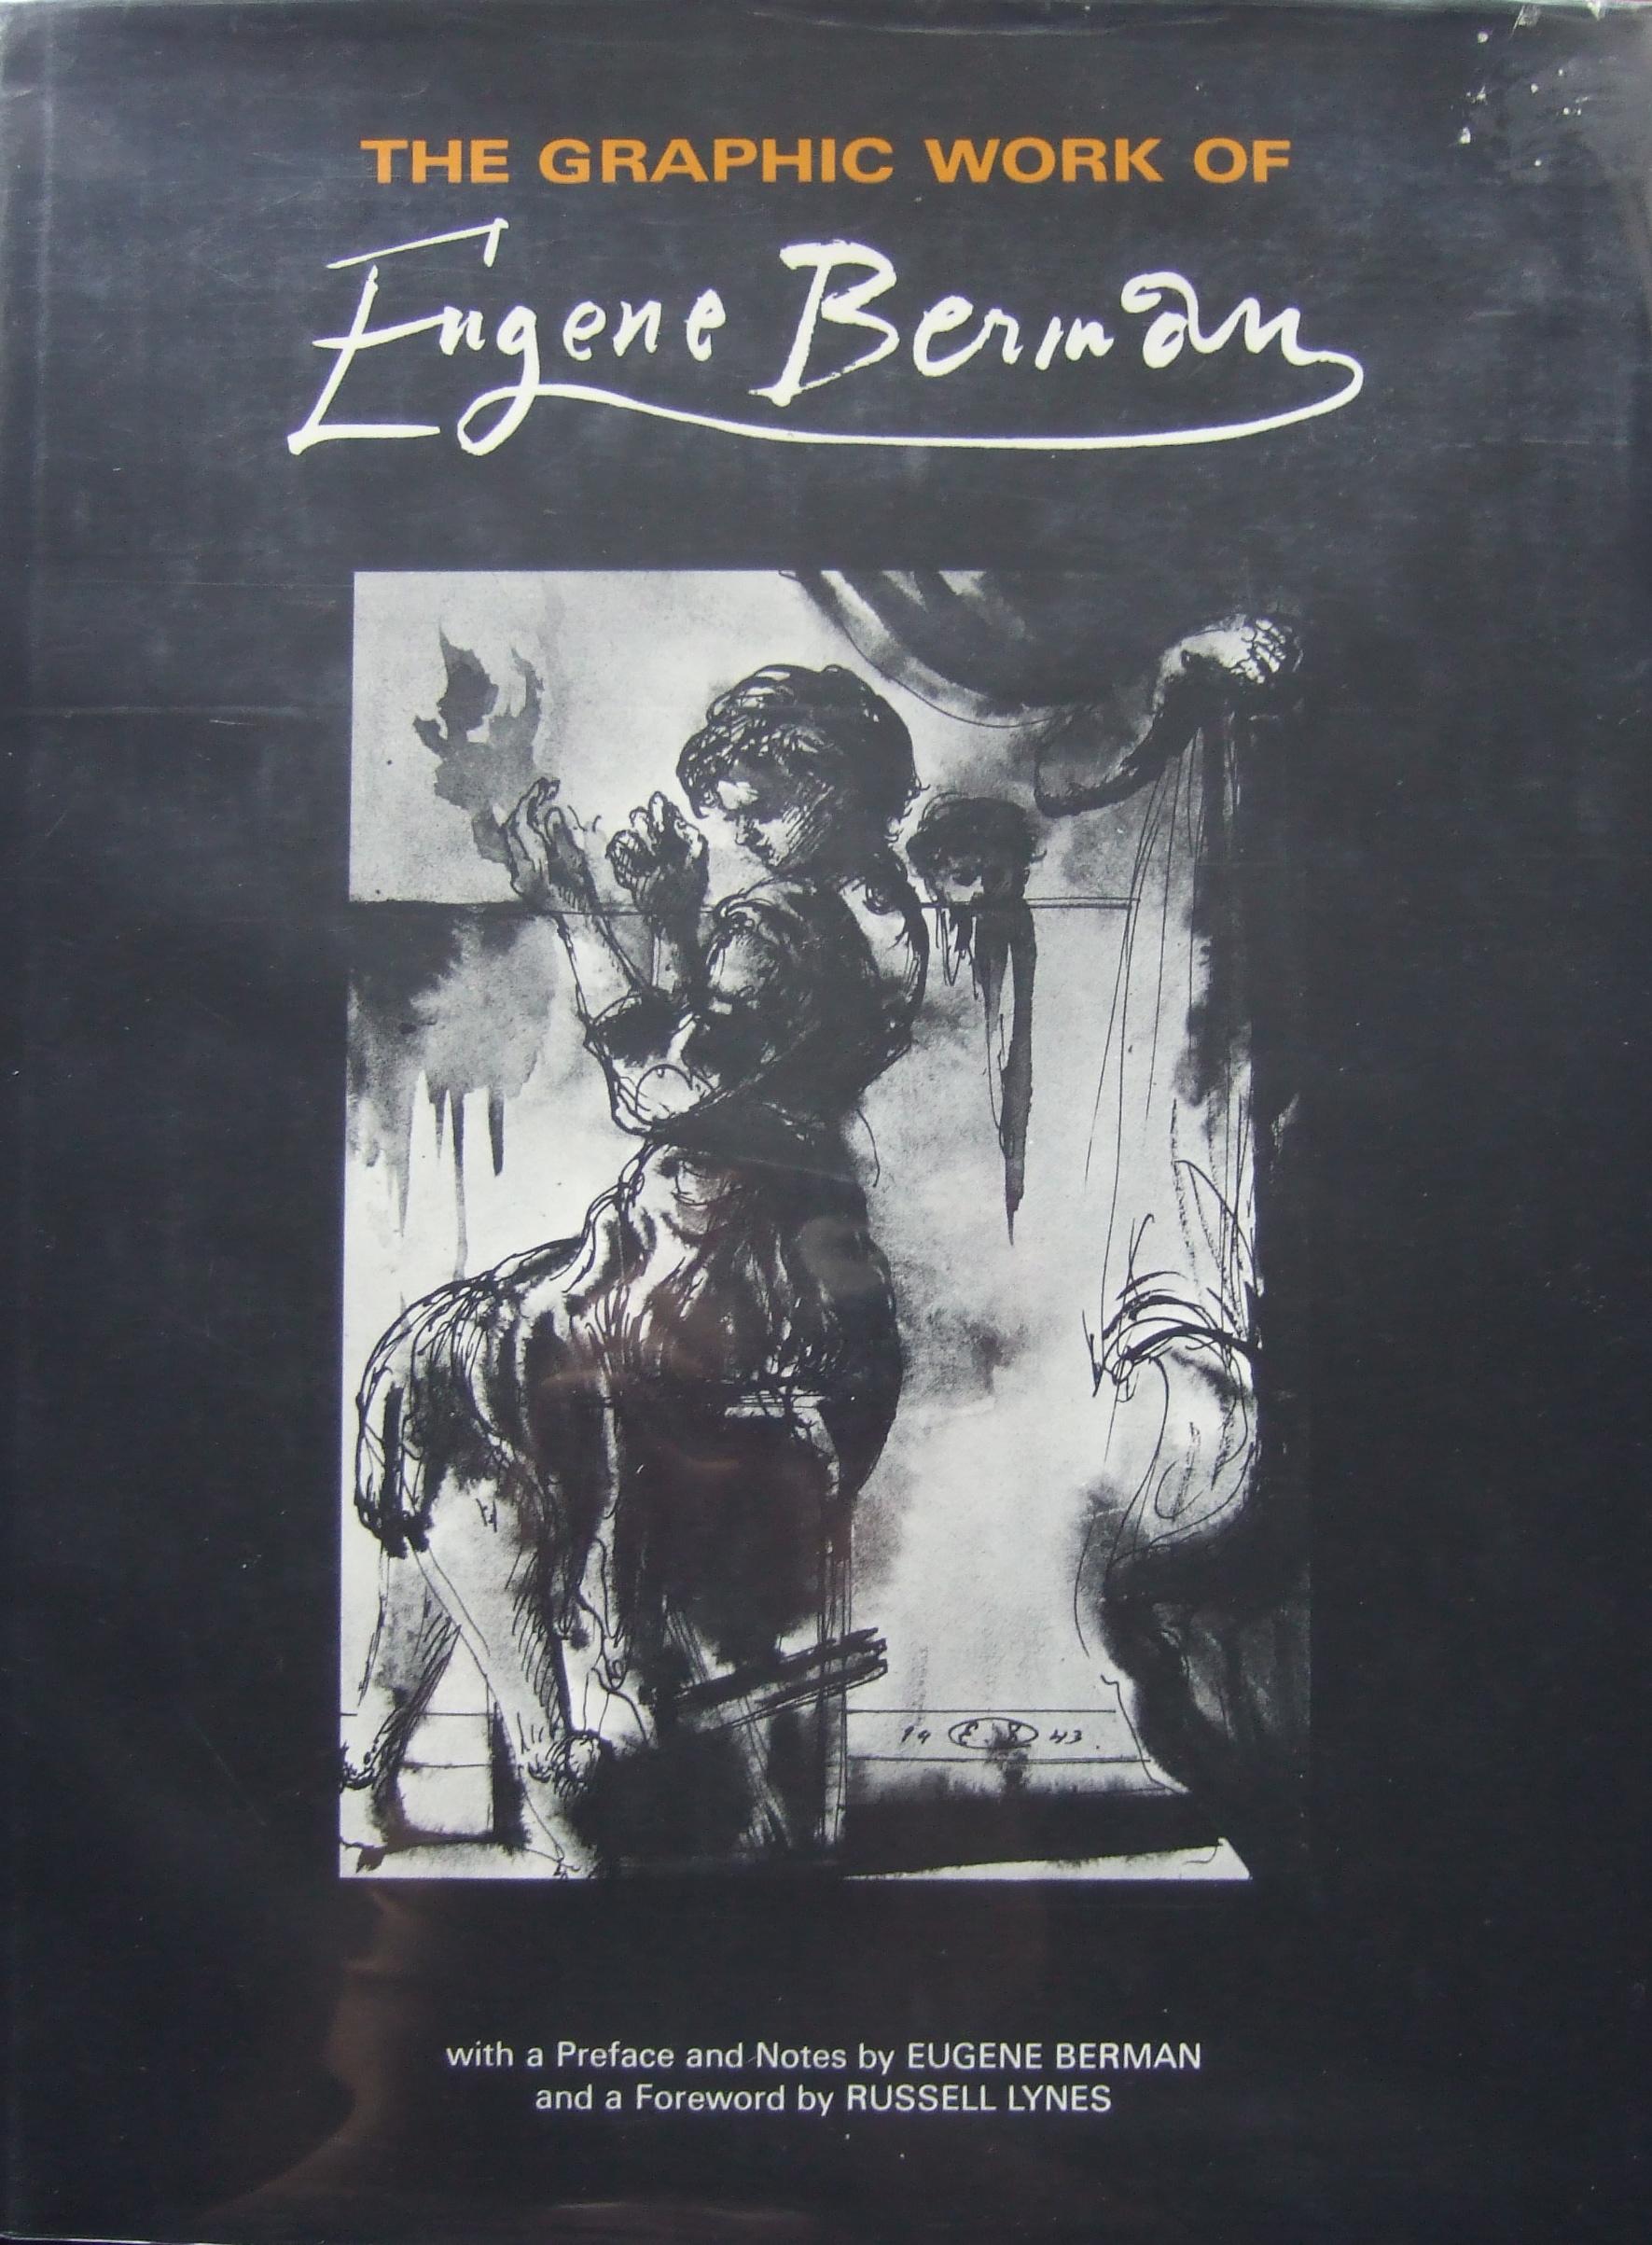 The Graphic Work of Eugene Berman